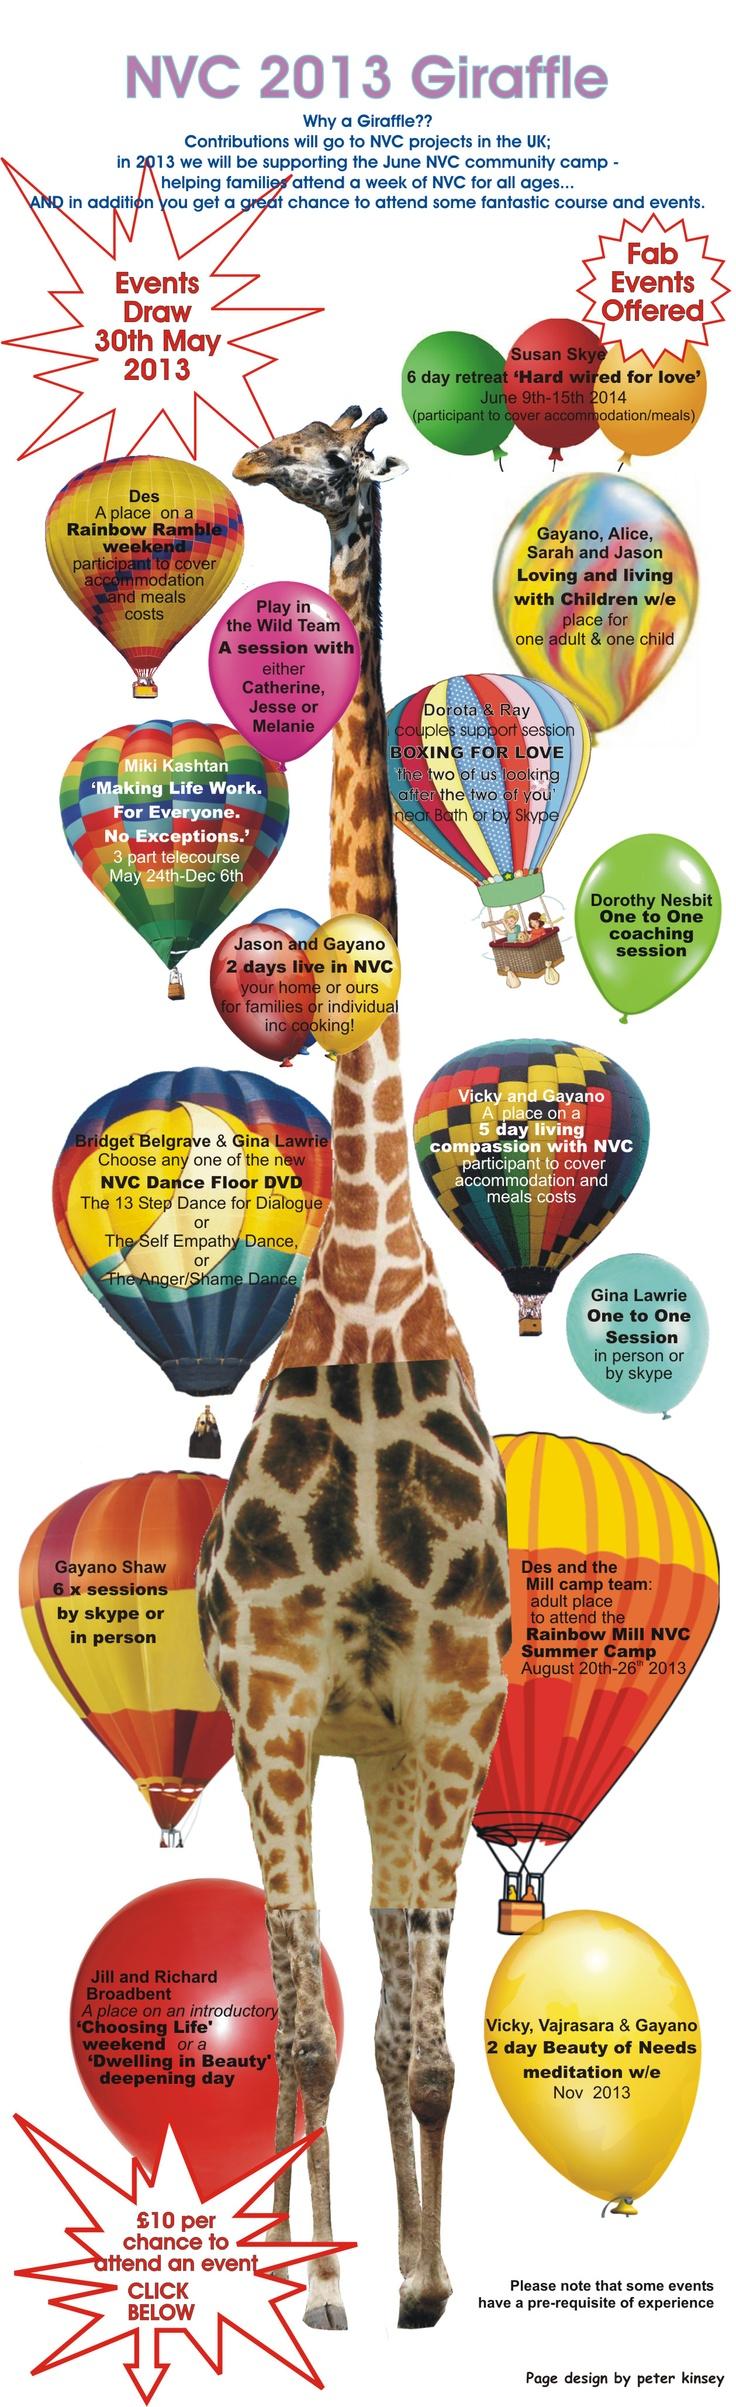 How do giraffes communicate?